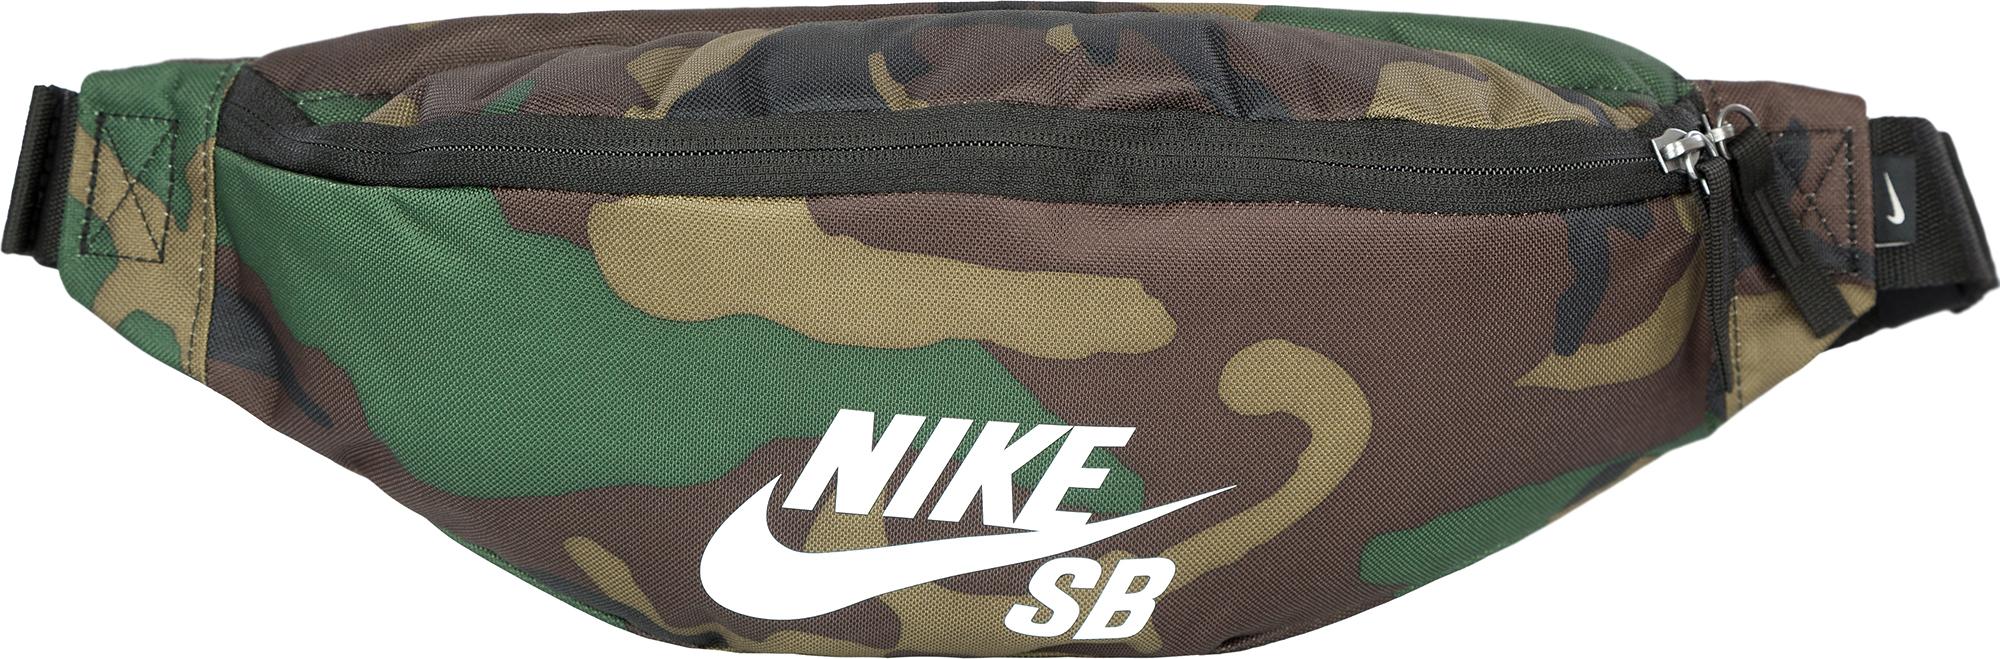 все цены на Nike Сумка на пояс Nike Heritage онлайн